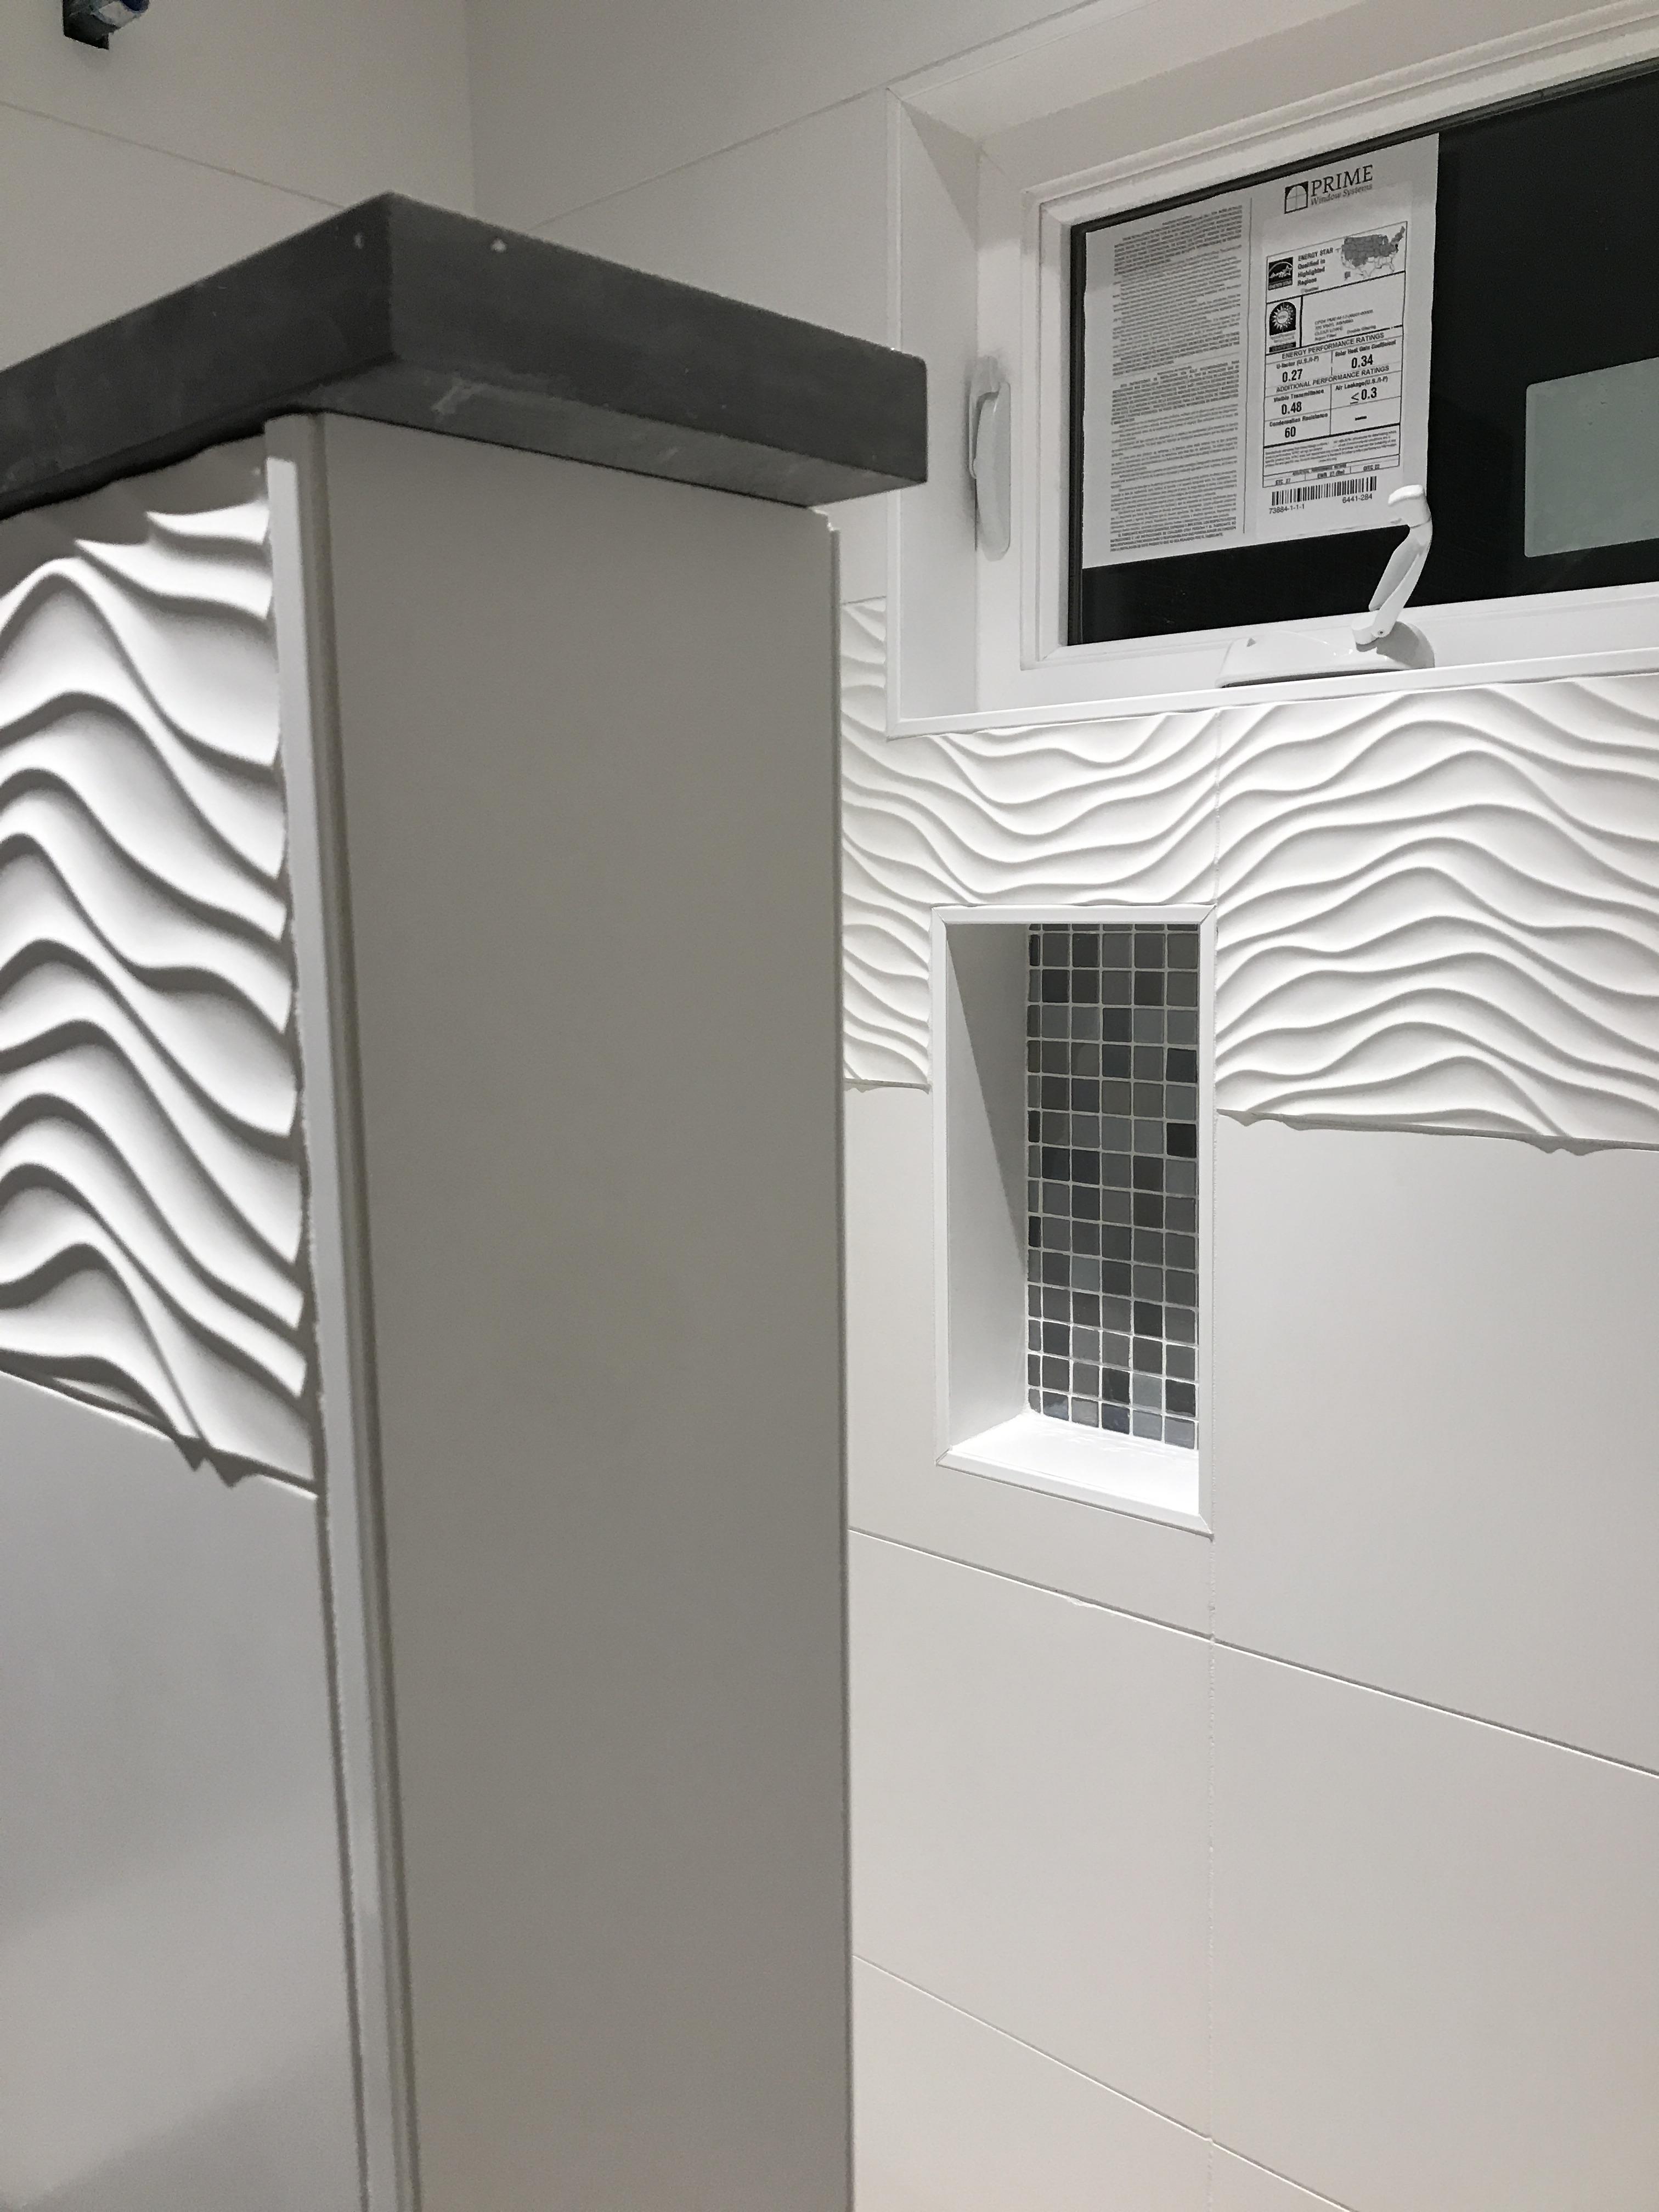 Help me out. Complete bathroom tiled.-8c60a845-193d-4a03-943d-90273c8db277_1528155323470.jpeg